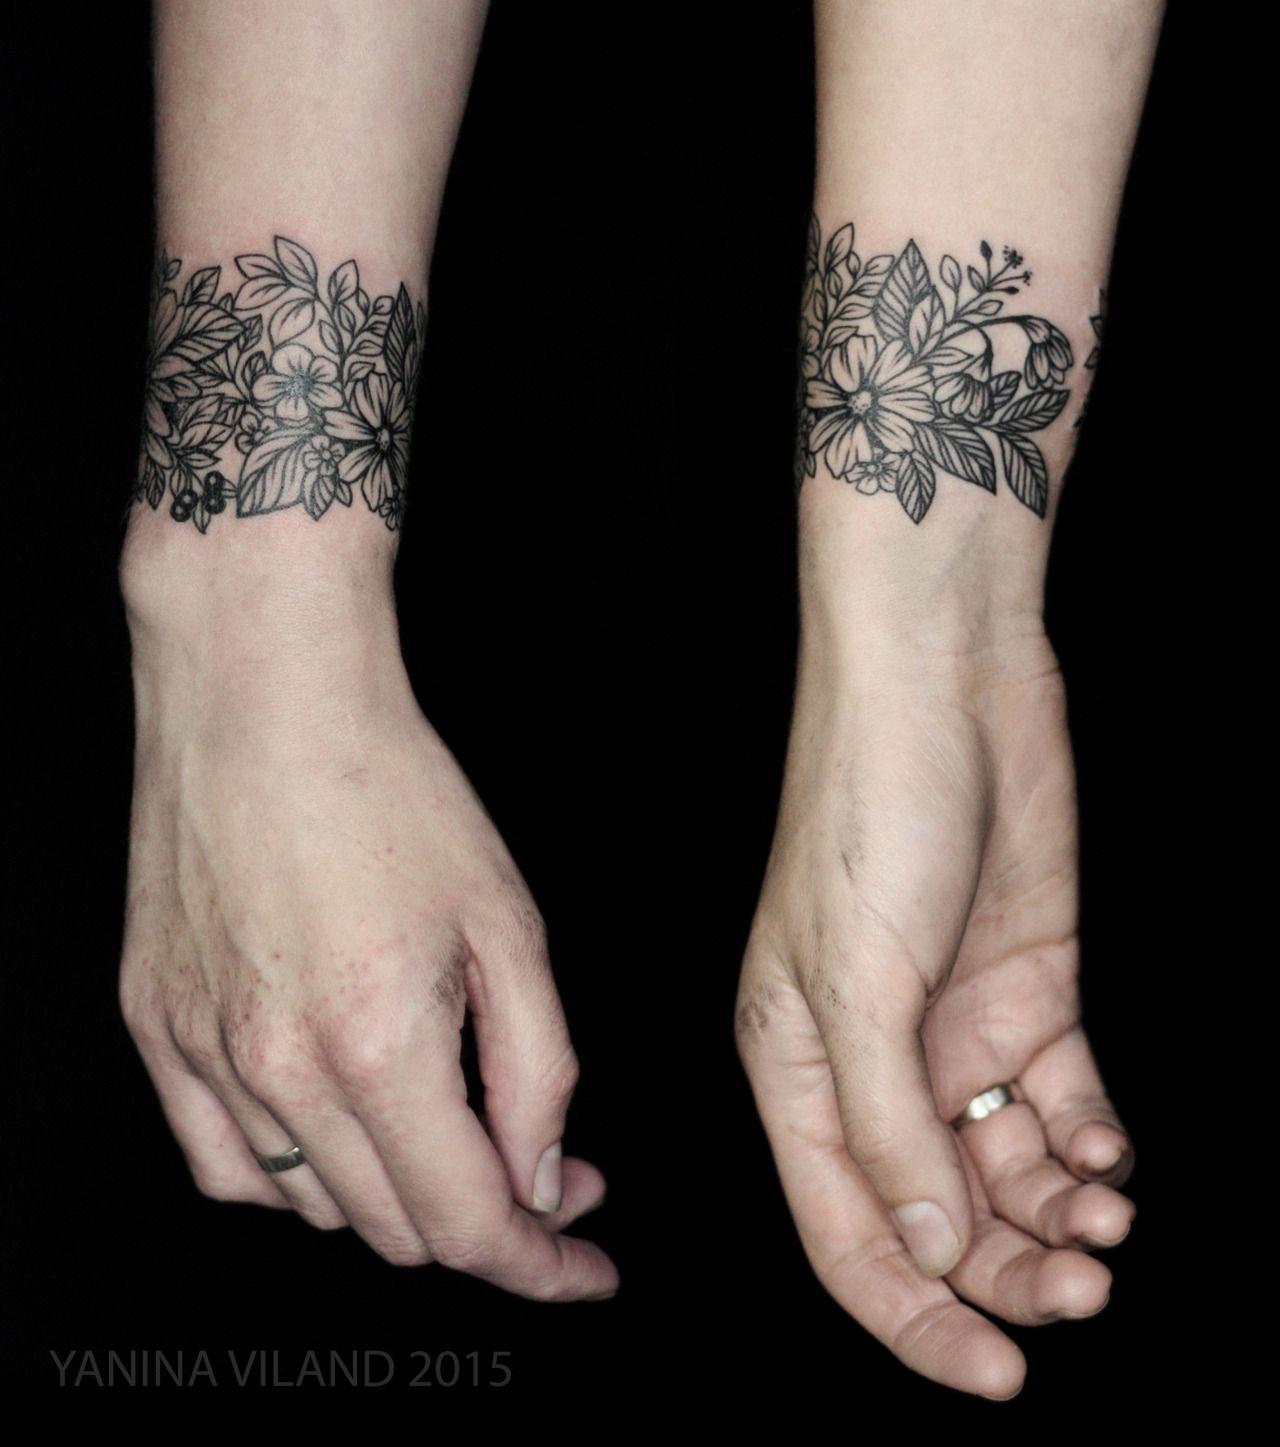 Yanina viland tattoo pinterest posts and tattoos and body art